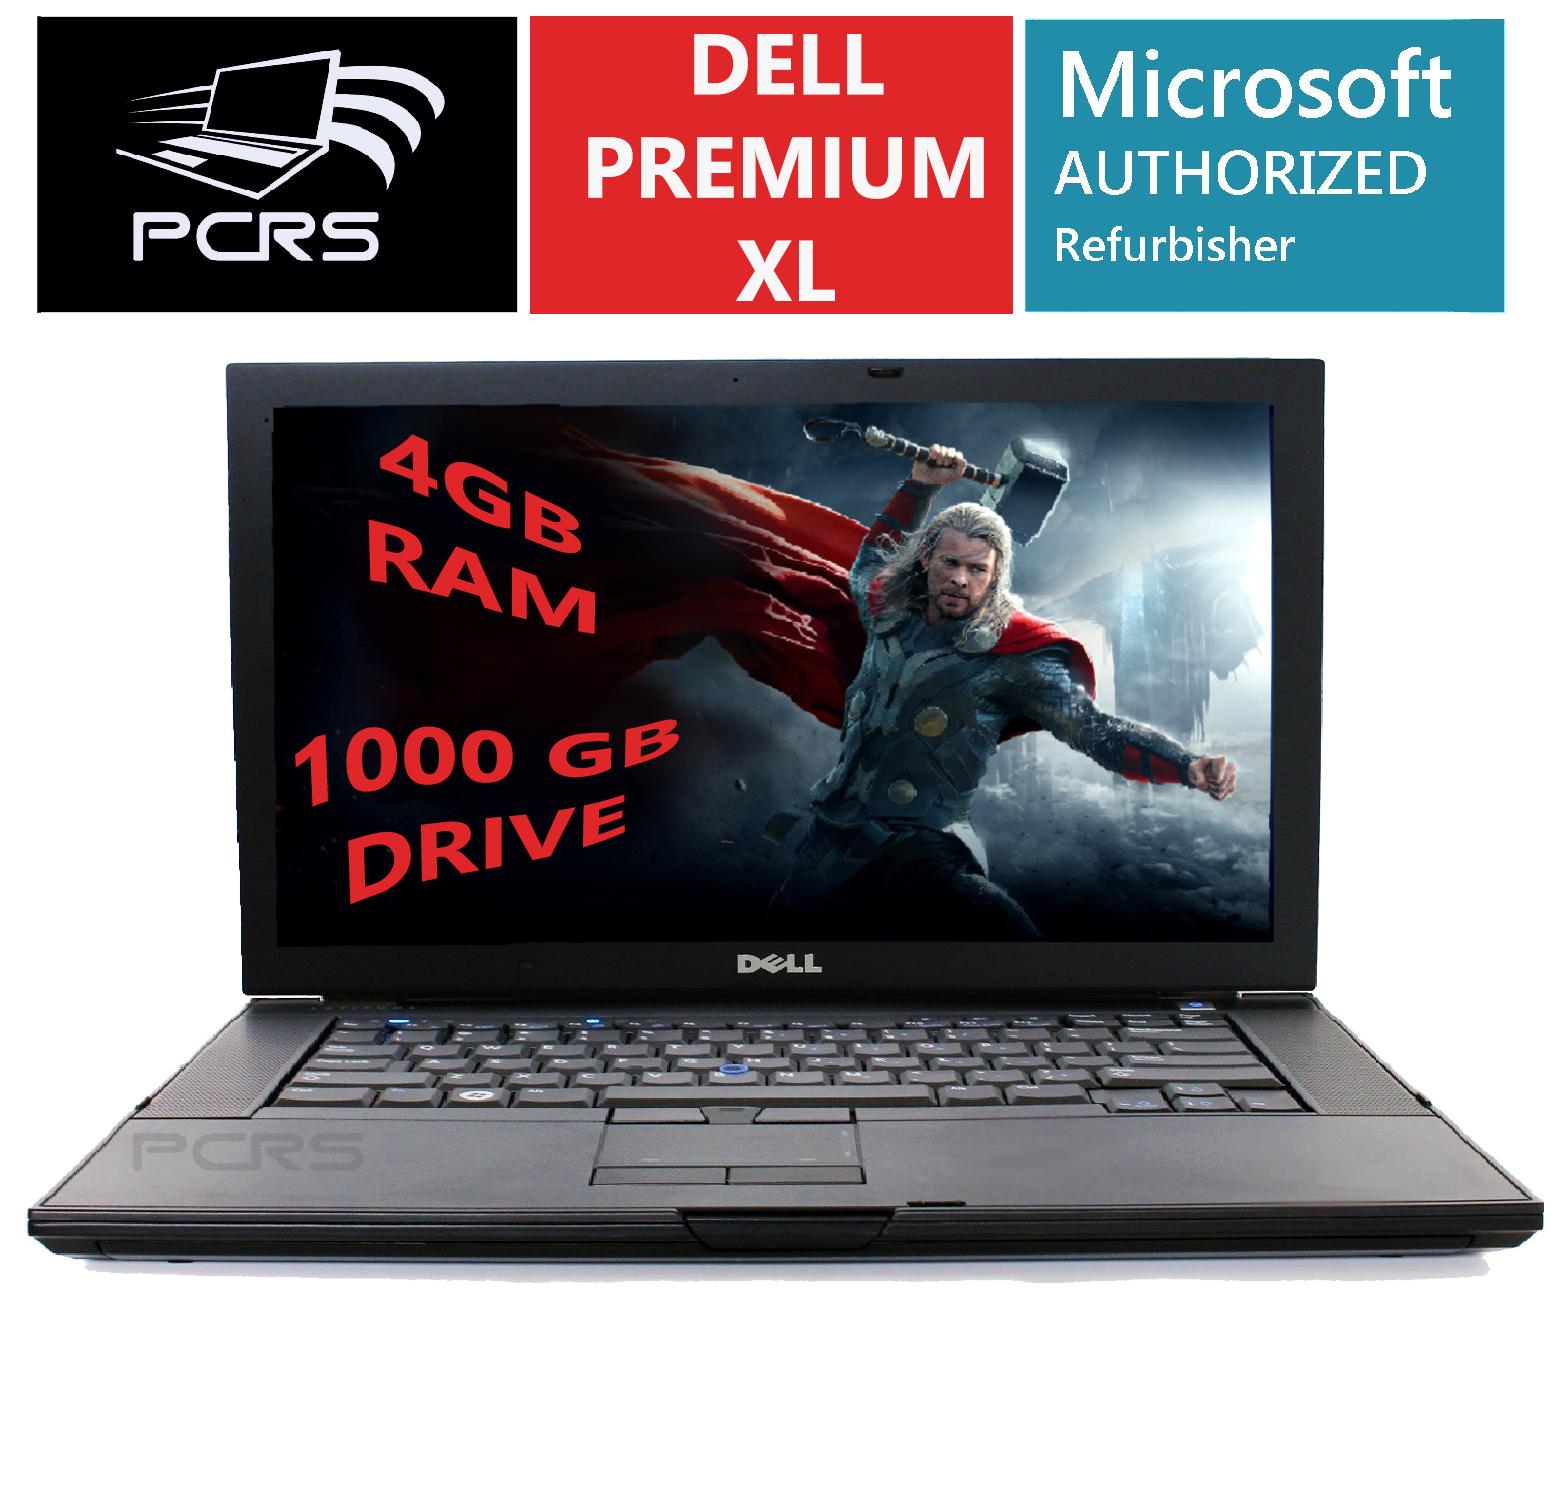 "Laptop Windows - DELL Latitiude 15.4"" HD Screen Laptop Intel 2.4GHz 4GB 1TB DVD+RW Windows 10"